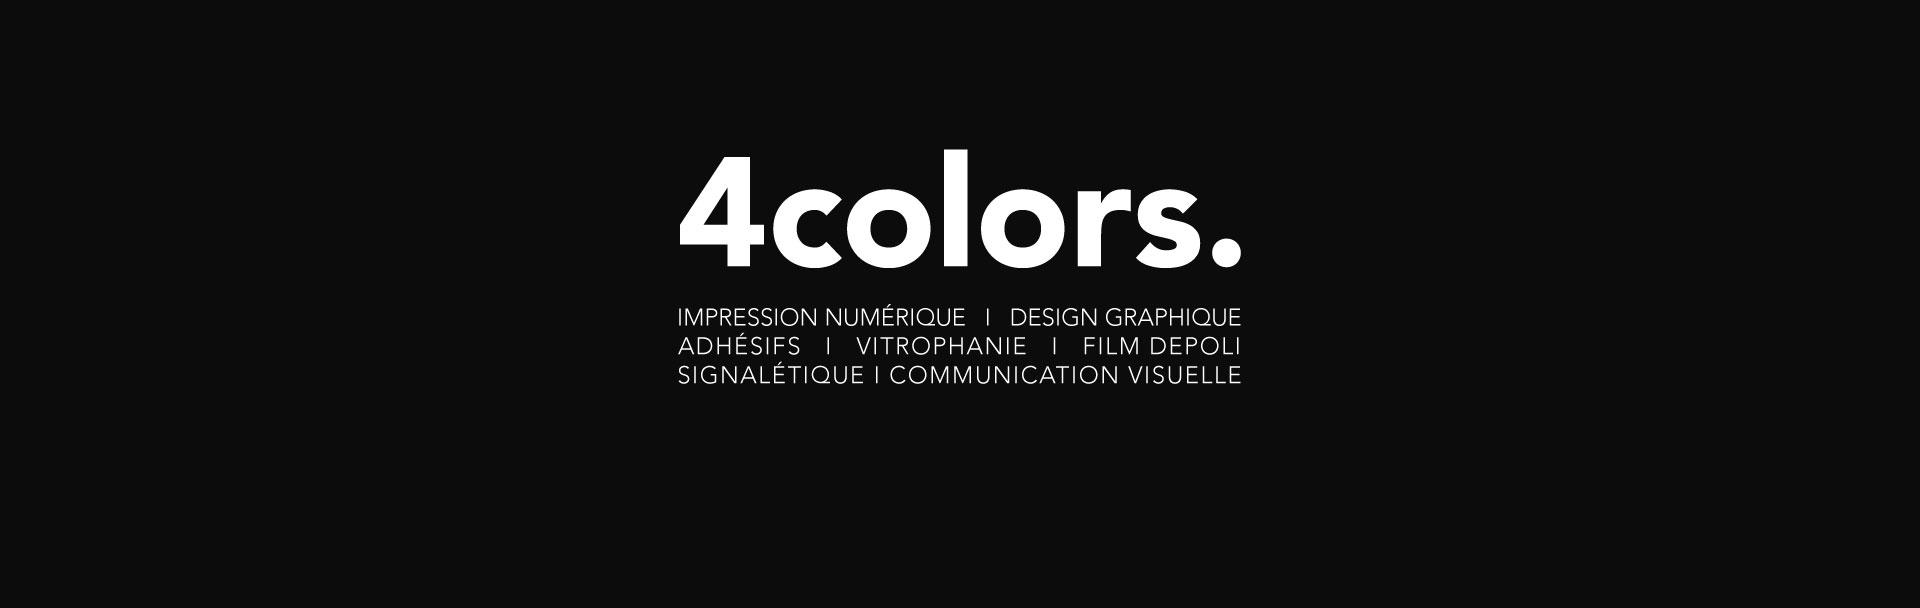 4 Colors Lyon